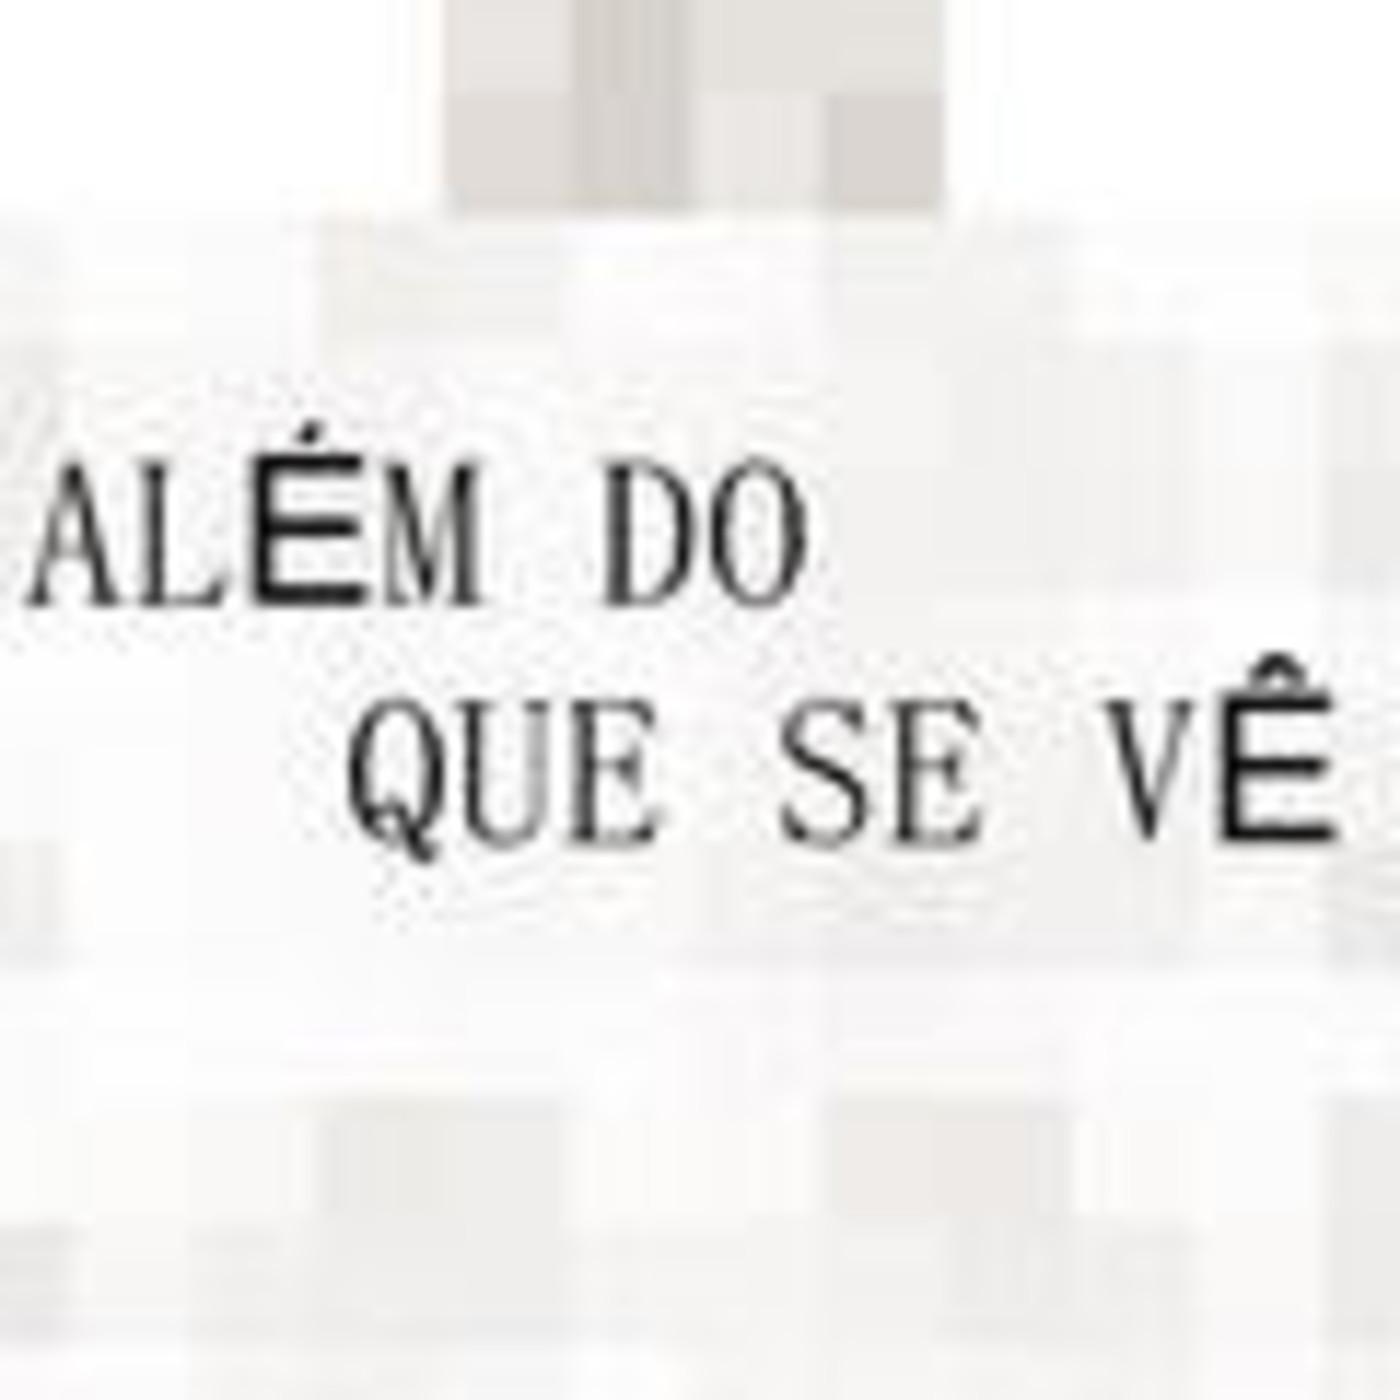 pterron@yahoo.com.br (Paulo Te